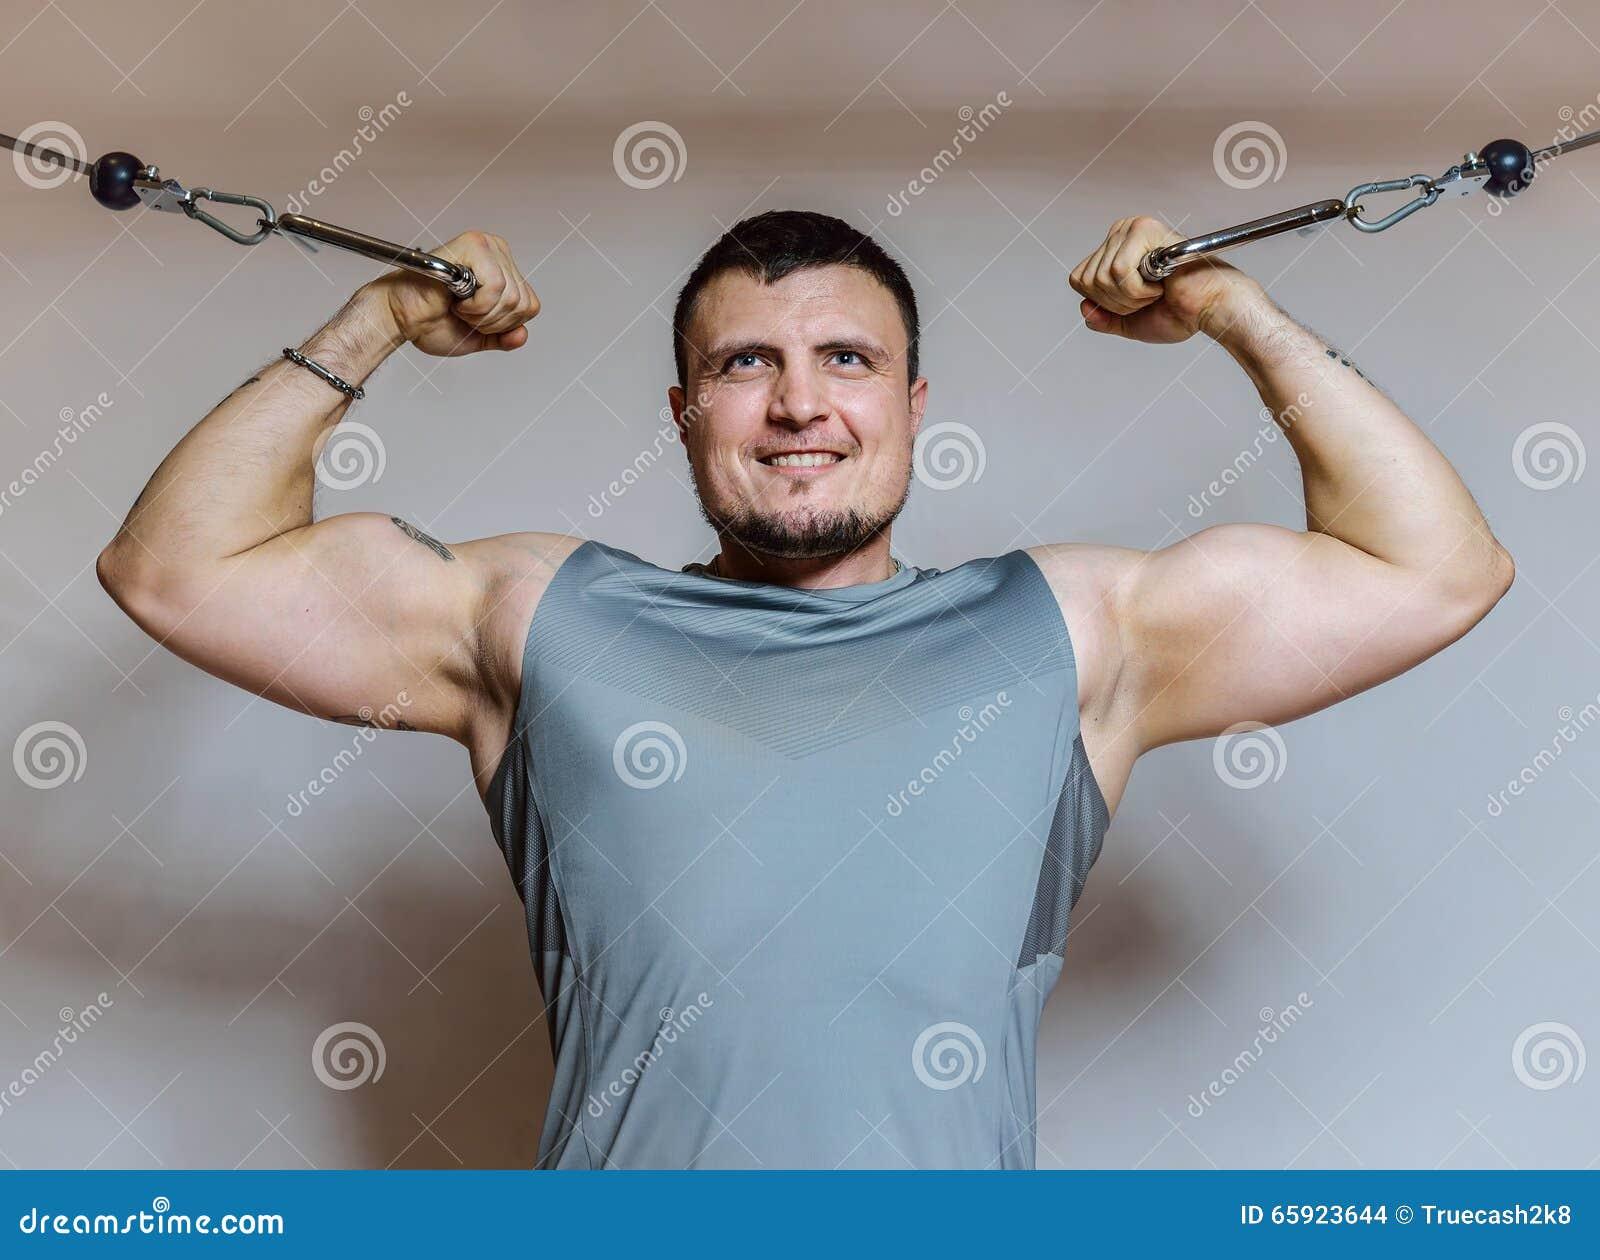 trabajar biceps en el gimnasio